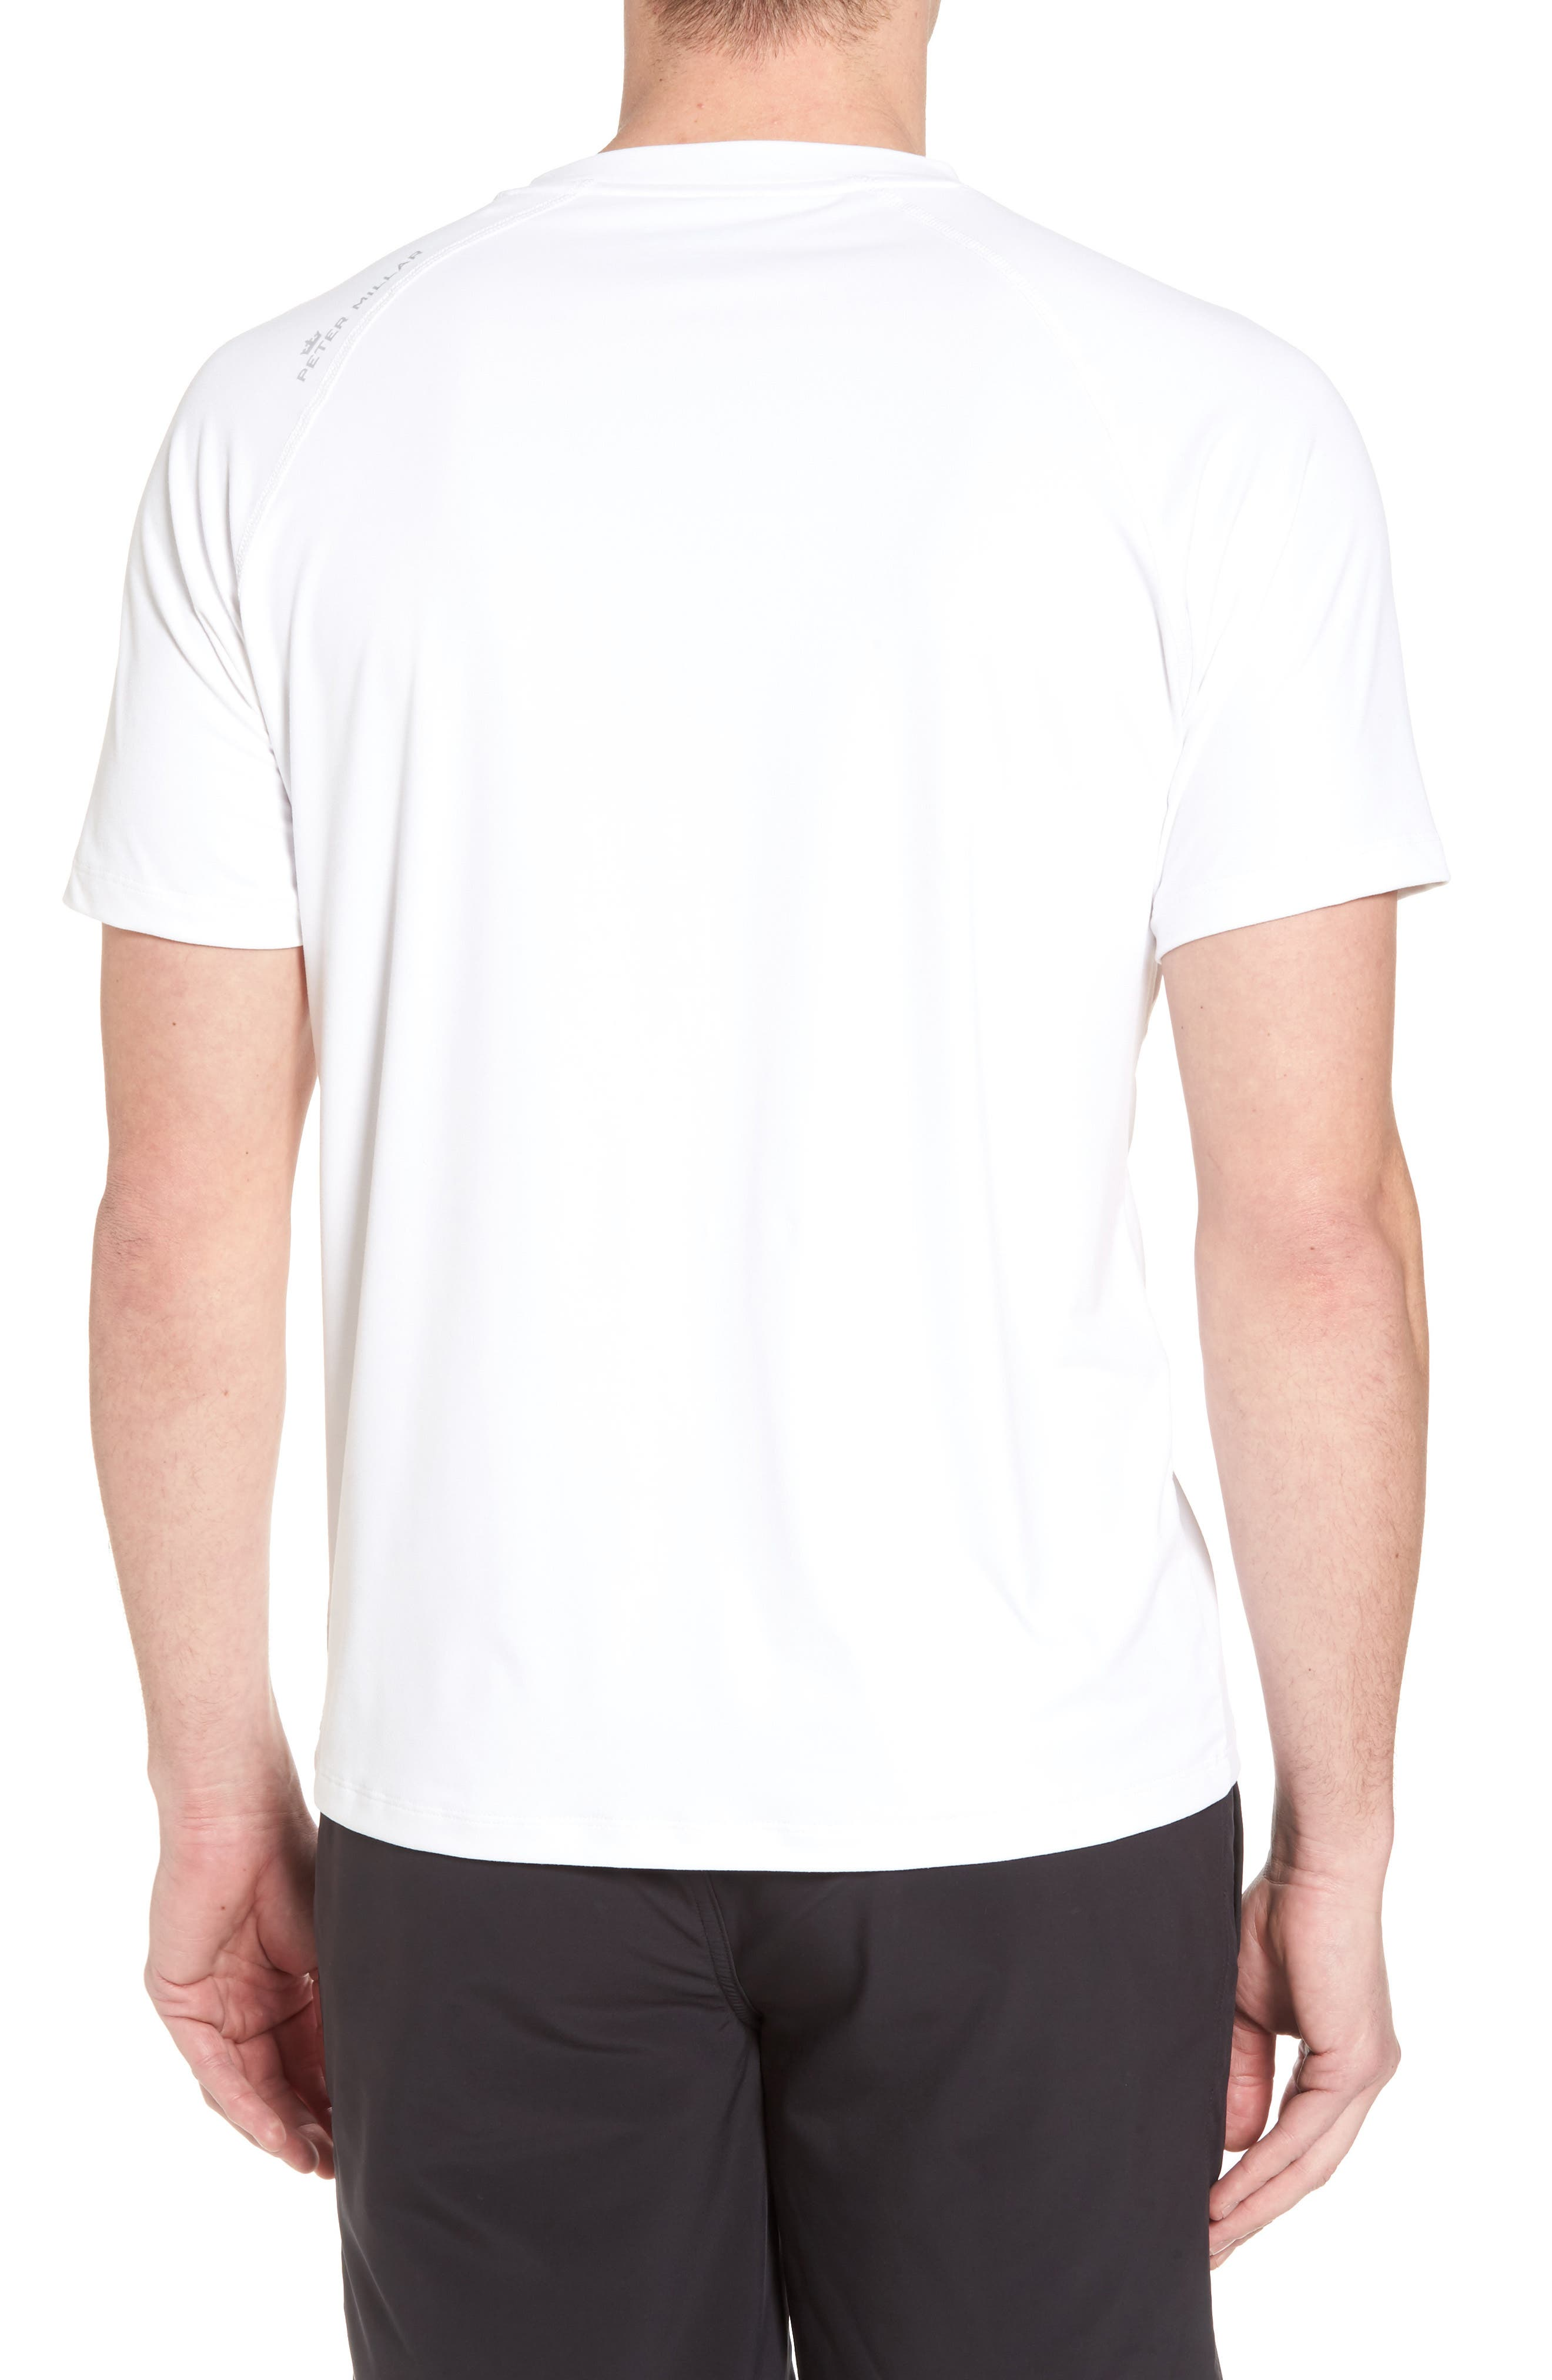 Rio Regular Fit Technical T-Shirt,                             Alternate thumbnail 2, color,                             White